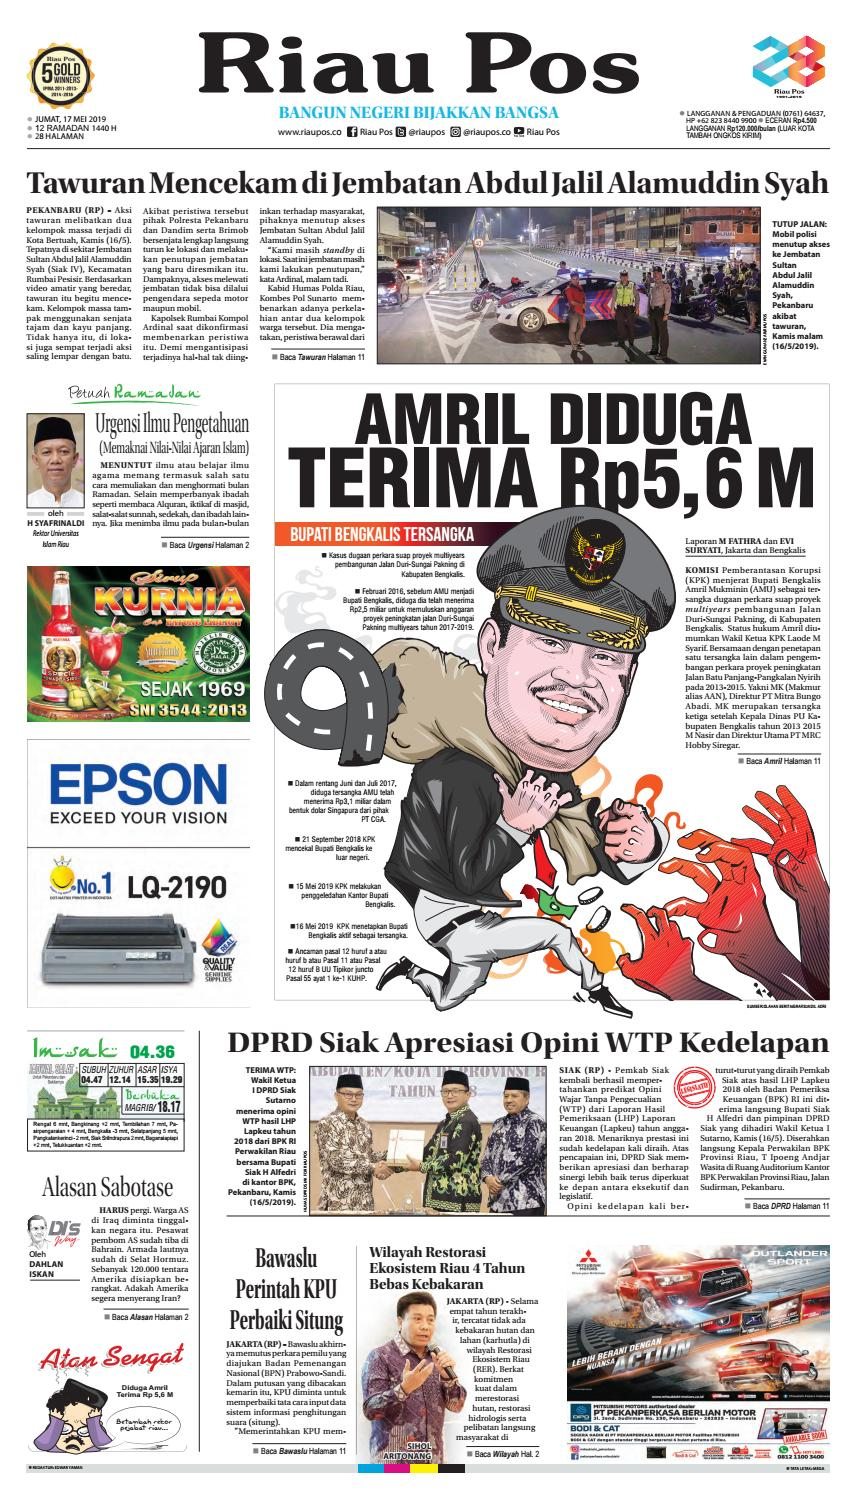 Riau Pos Edisi Jumat 17 Mei 2019 By Riau Pos Issuu